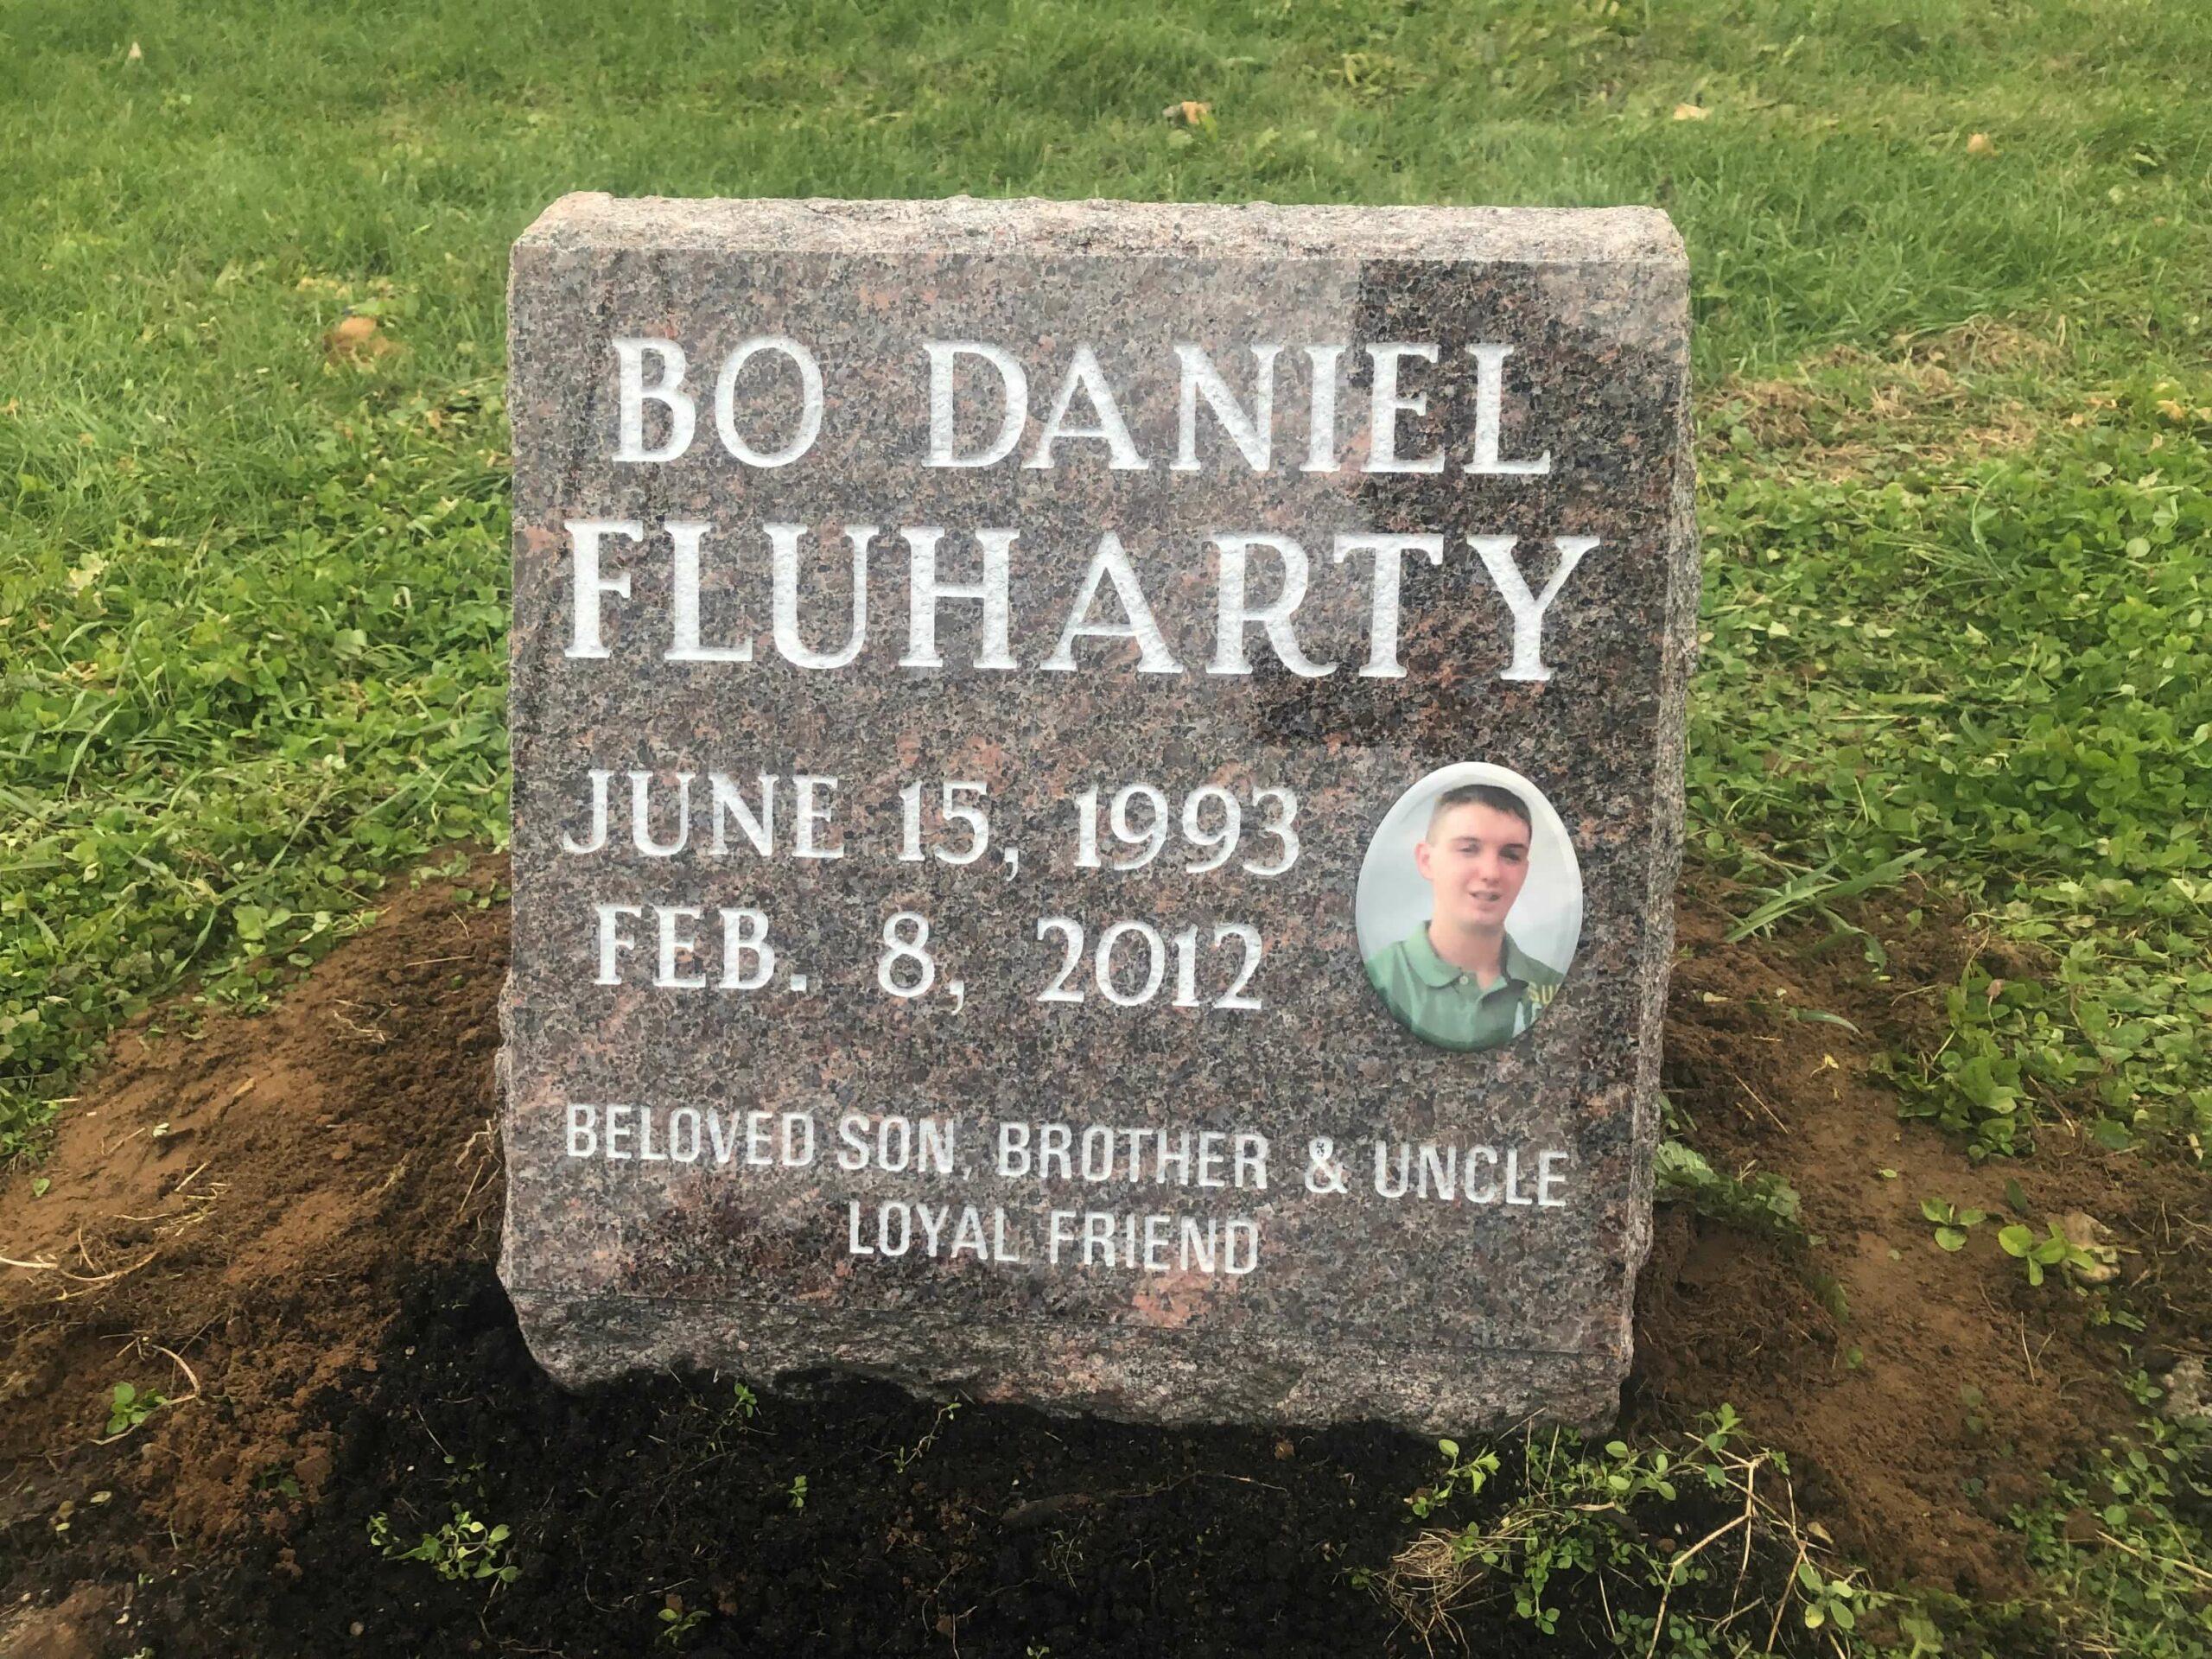 Fluharty, Bo Daniel - Duncan Falls Cem., 1-4, Mahogany